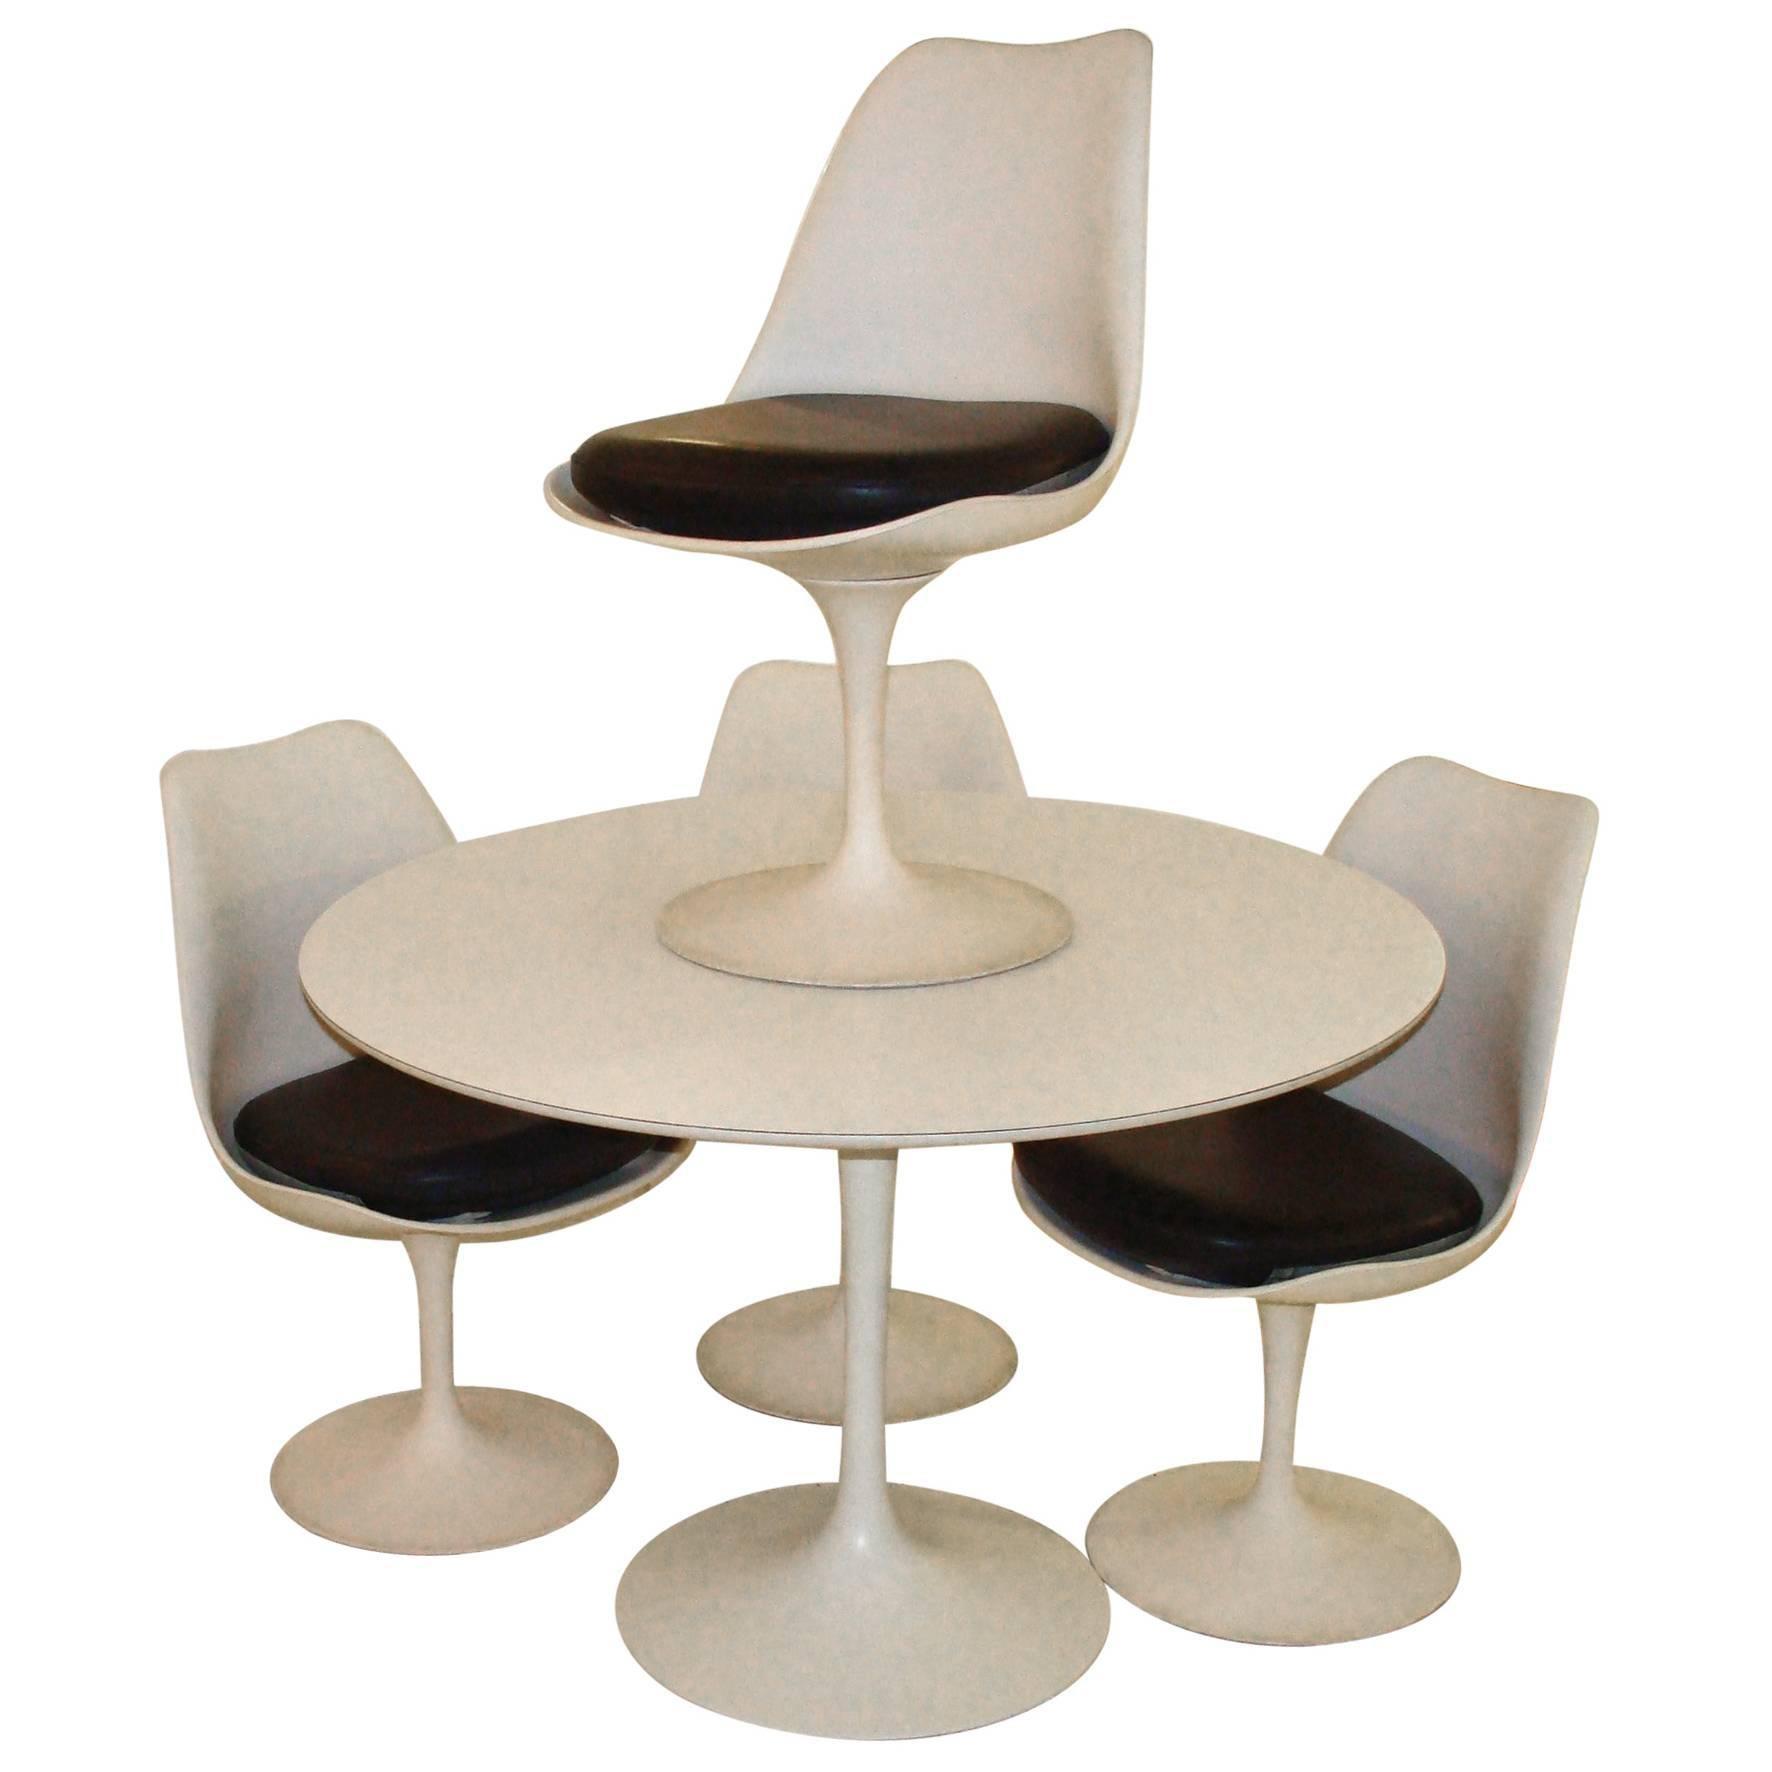 tulip table and chairs target on sale vintage knoll eero saarinen at 1stdibs for